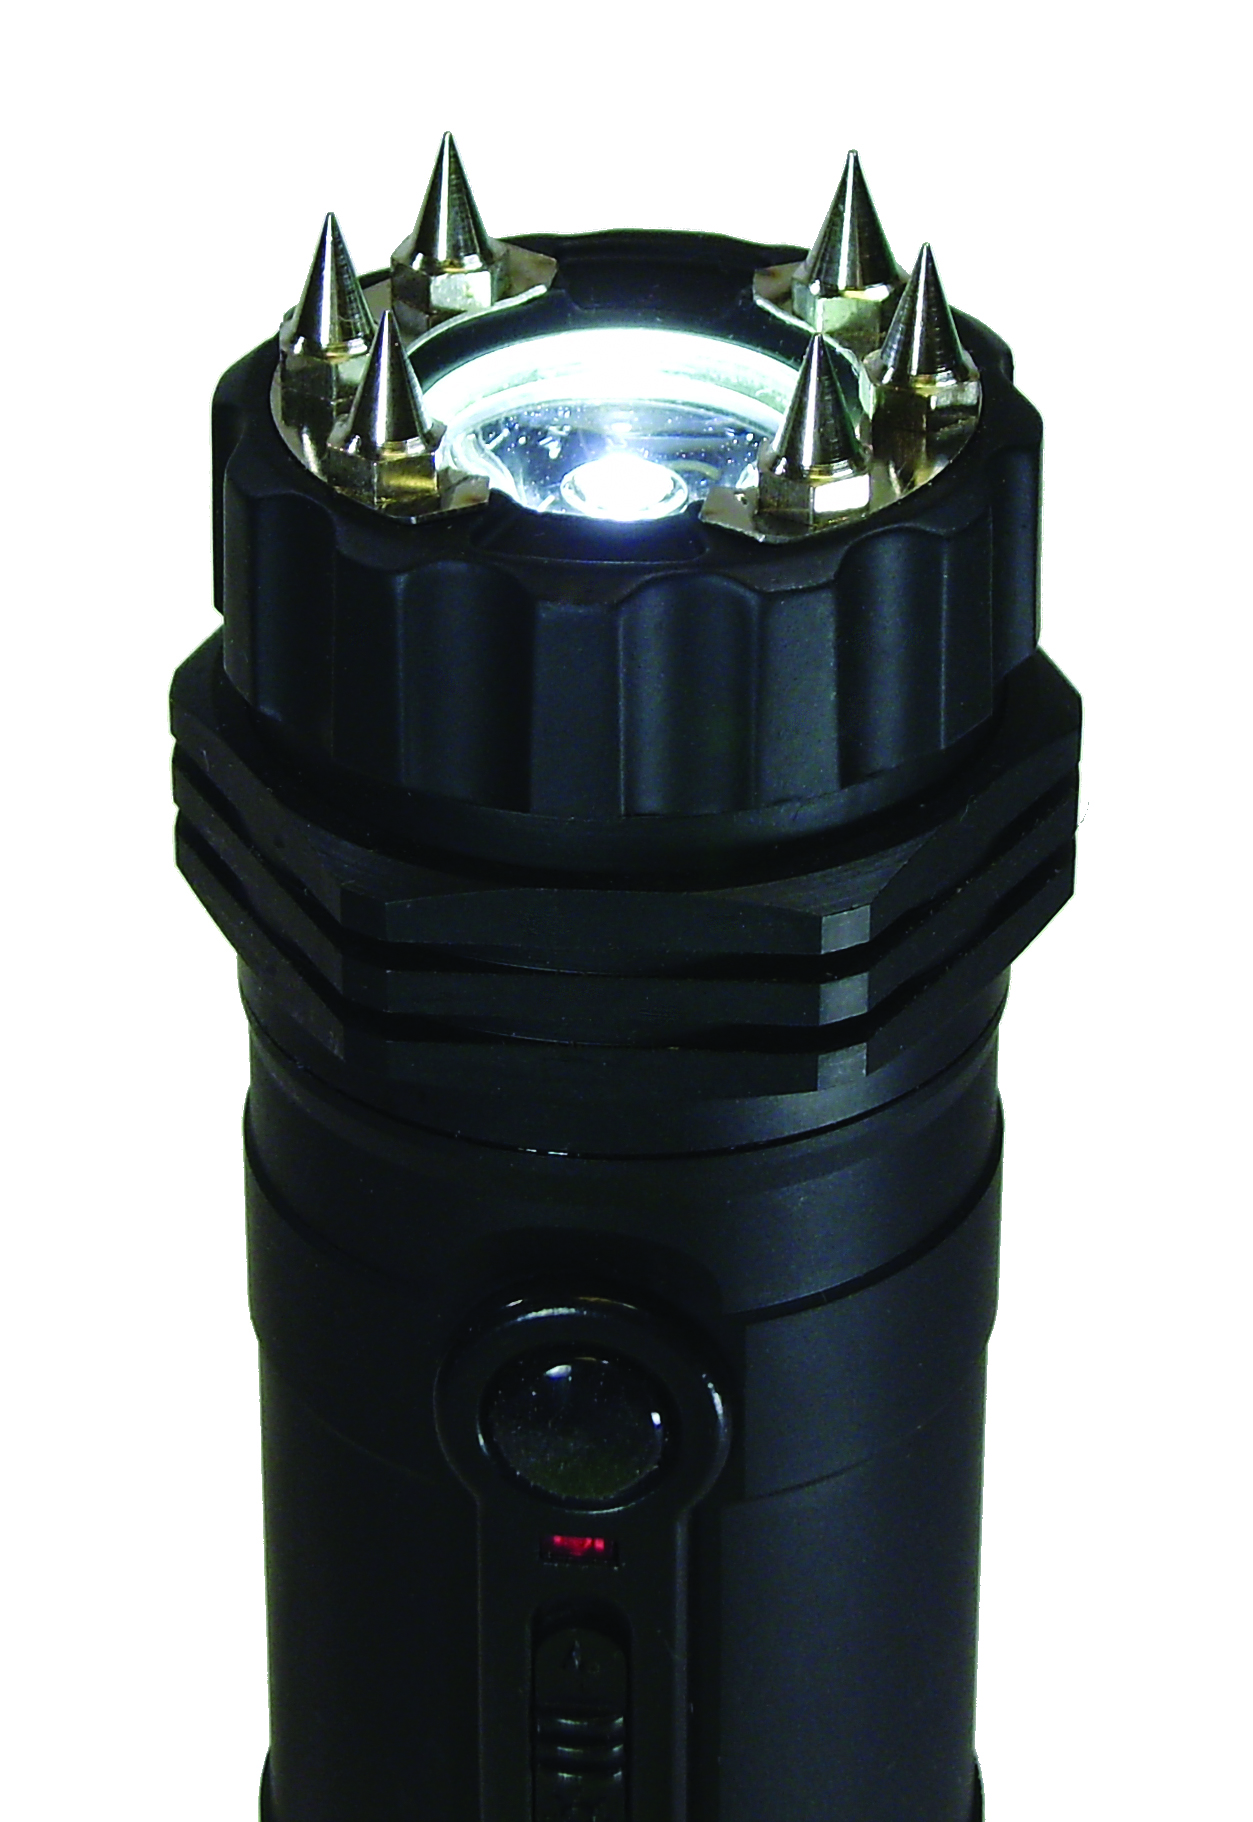 Zap Light Extreme 1 000 000 Volt Stun Gun Flashlight